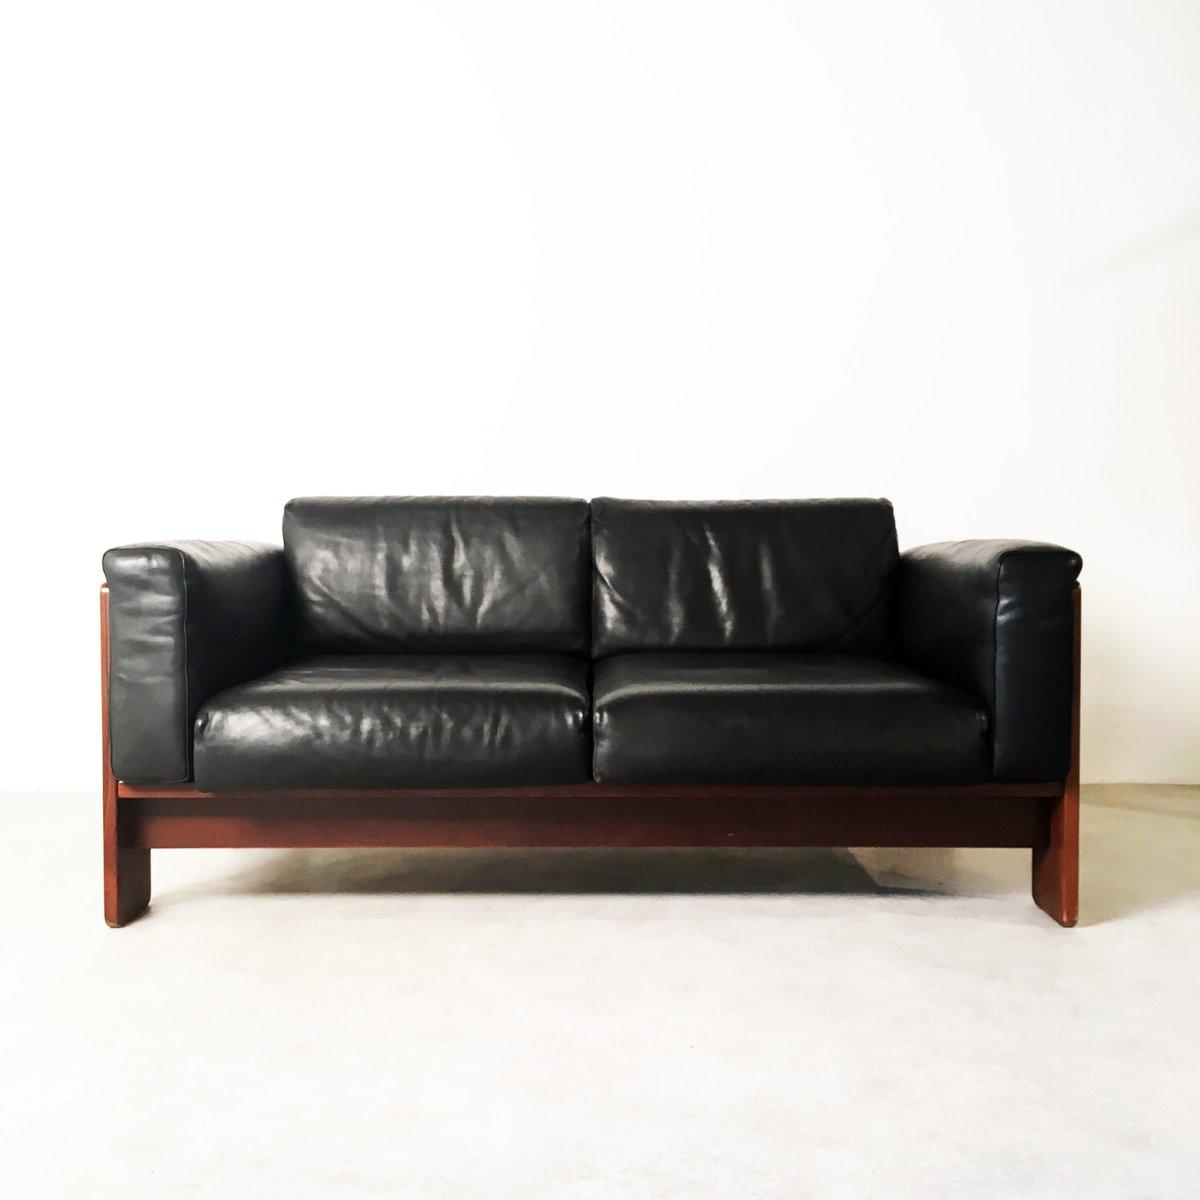 bastiano zwei sitzer sofa von afra and tobia scarpa f r gavina 1960er bei pamono kaufen. Black Bedroom Furniture Sets. Home Design Ideas